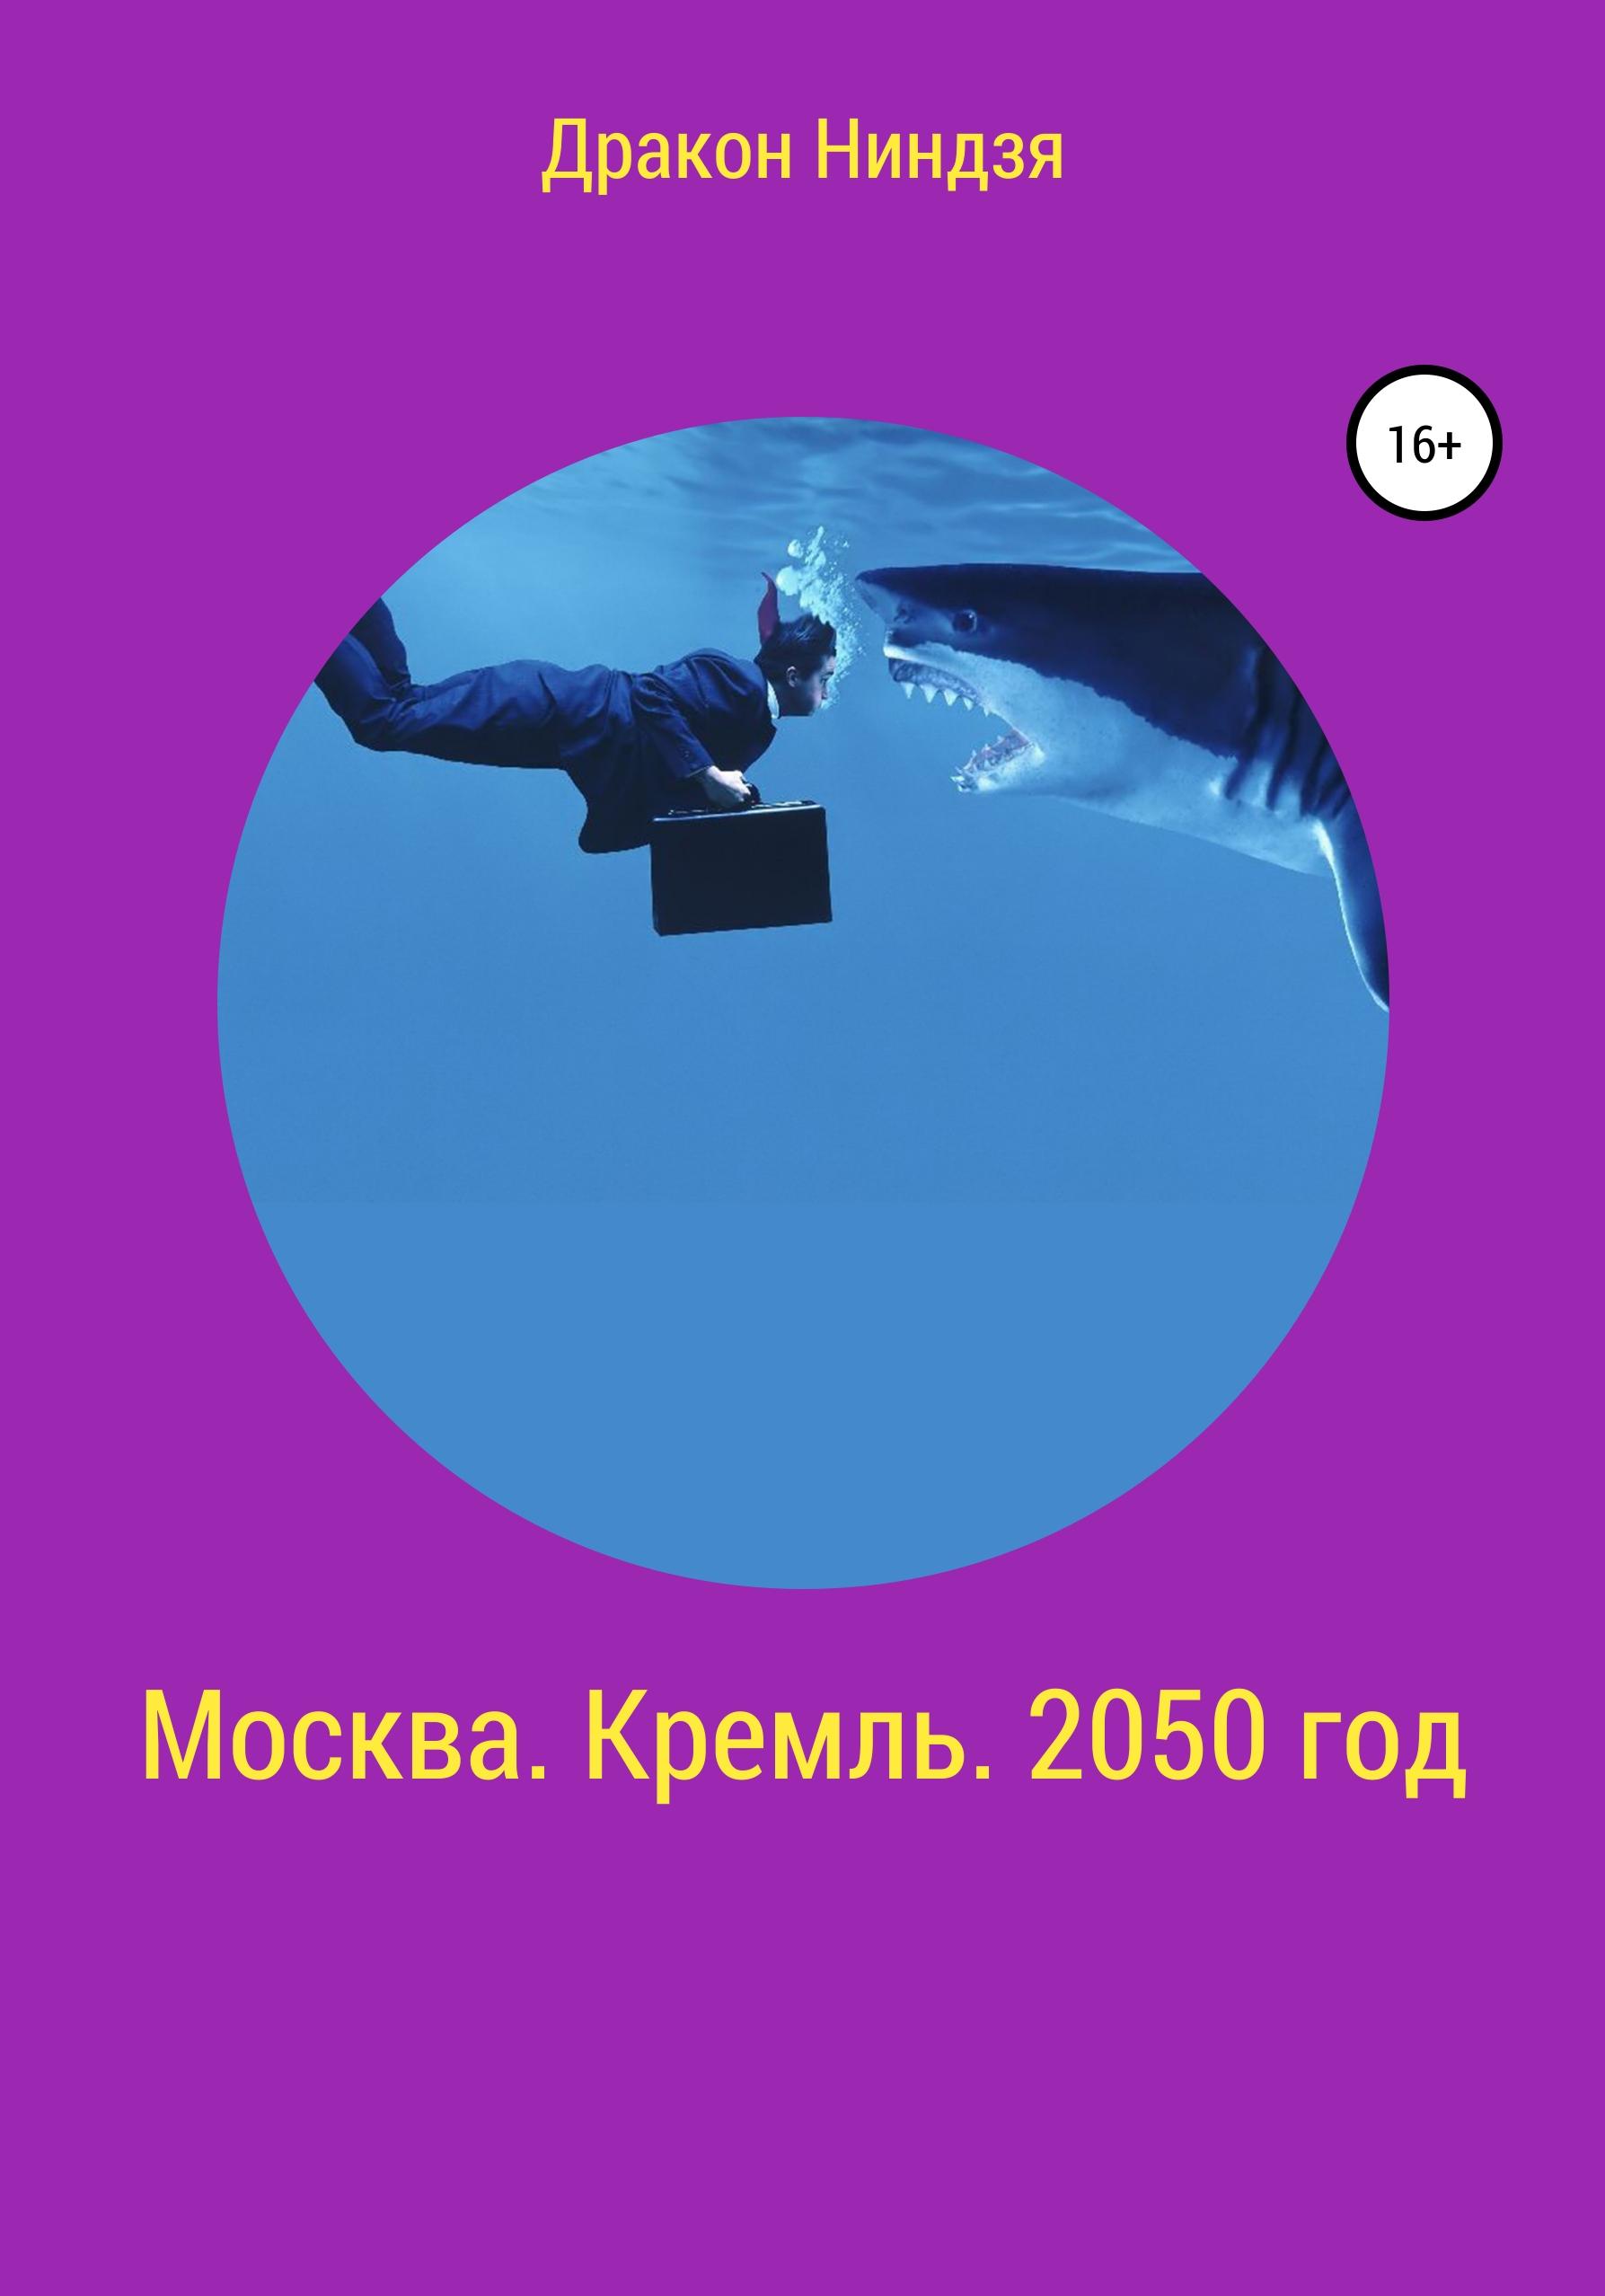 Дракон Ниндзя - Москва. Кремль. 2050 год